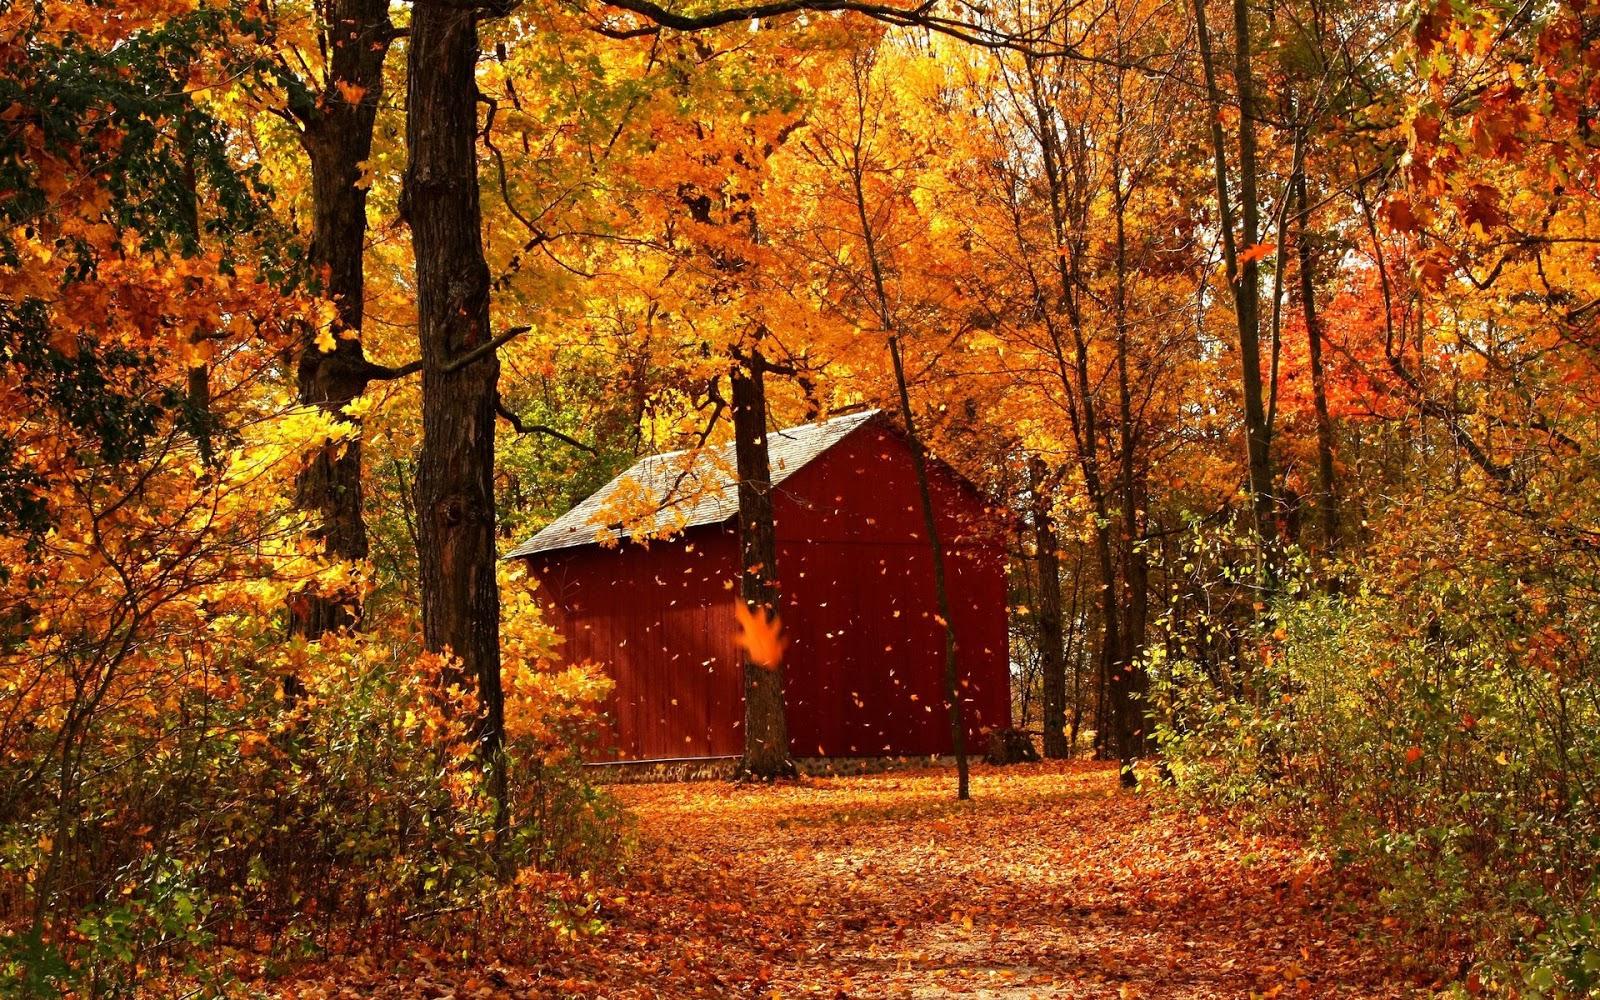 Fond d 39 cran automne hd gratuit fond d 39 cran hd for House image full hd